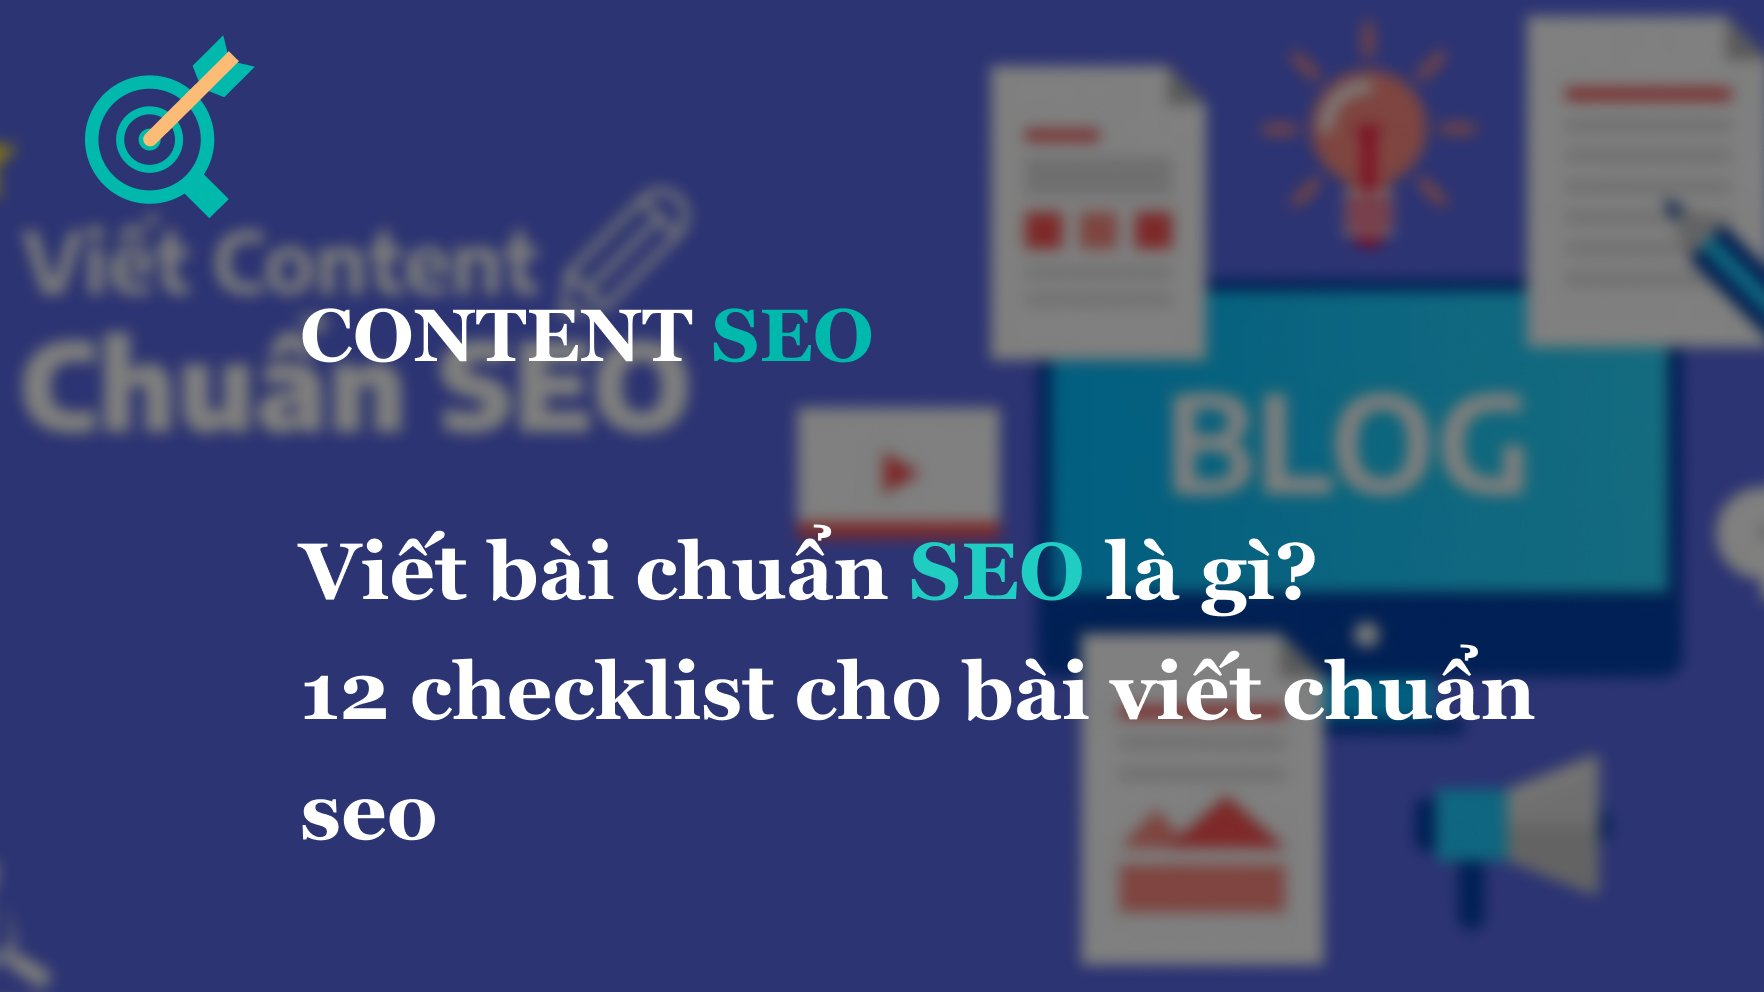 Viết bài chuẩn SEO là gì? 12 checklist cho bài viết chuẩn seo